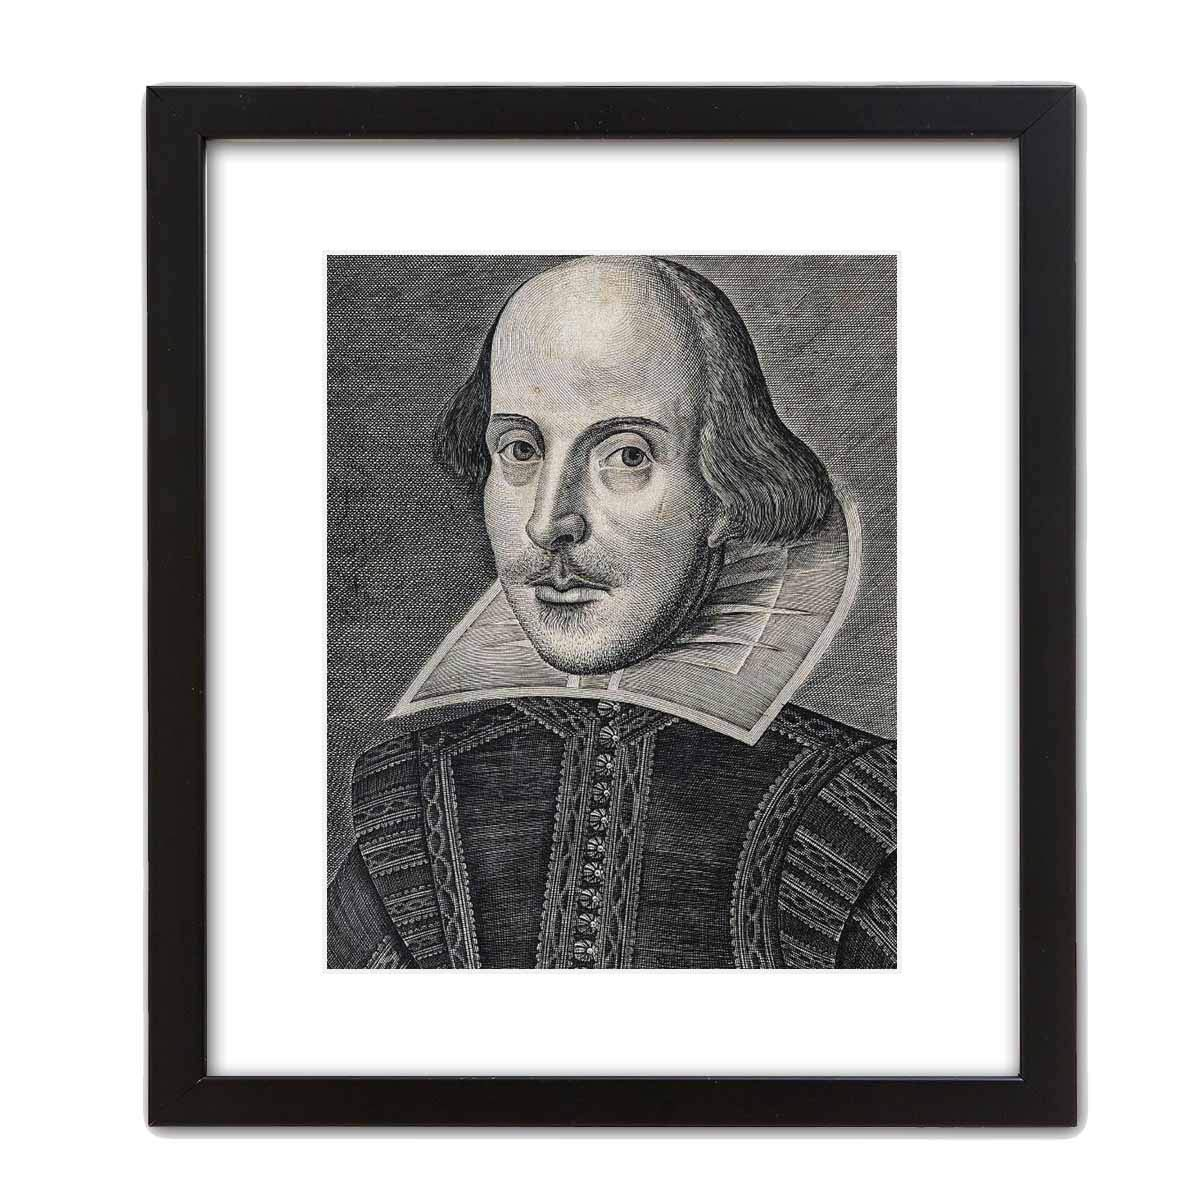 ArtDash Studio Decorative Canvas Art Print William Shakespeare 16/×20